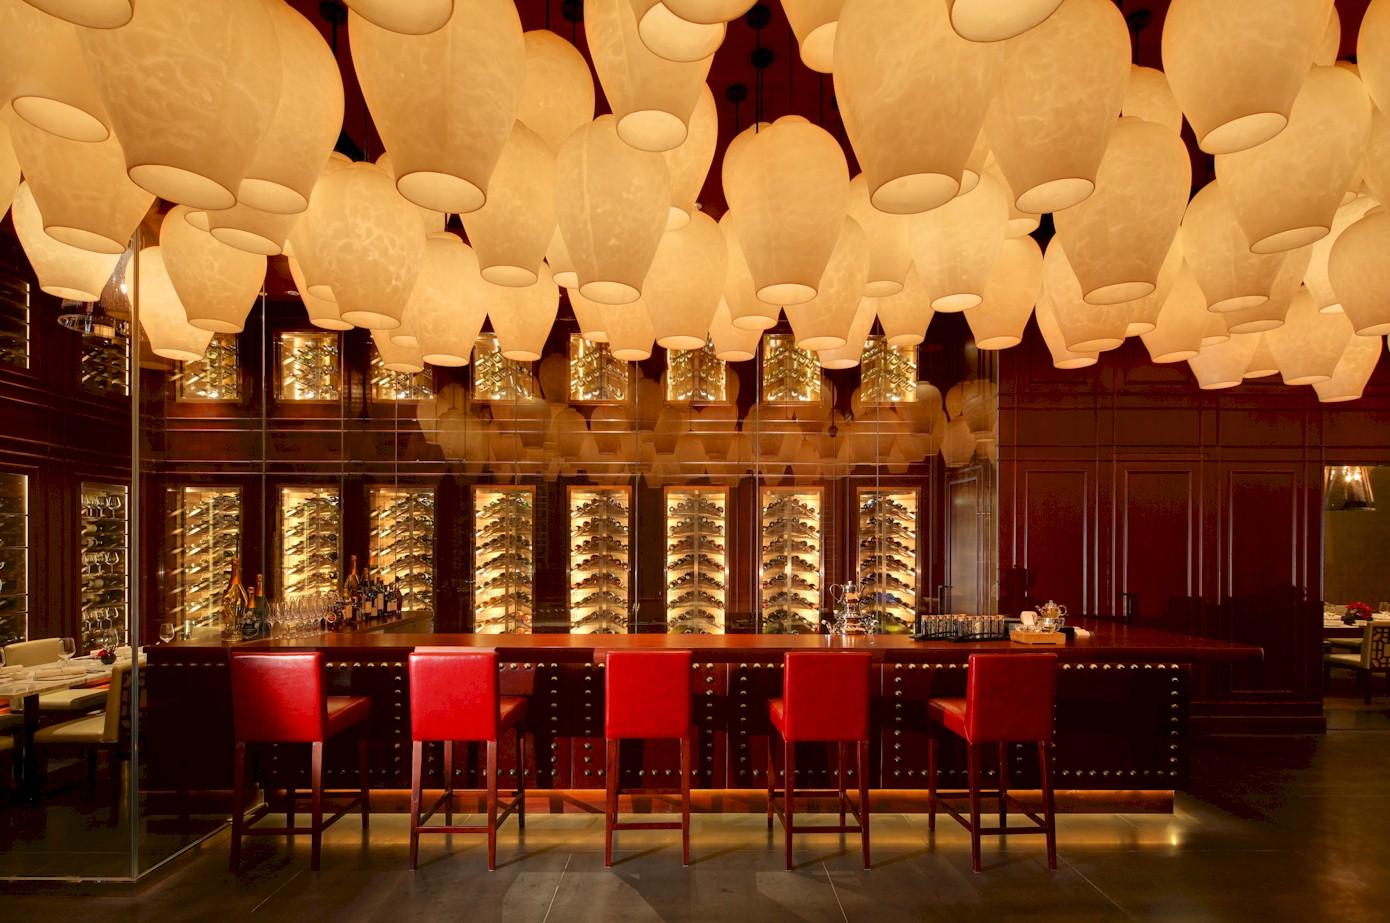 Yong Yi Ting at the Mandarin Oriental in Shanghai / Entry / Wine Bar. Photo: Xu Fei